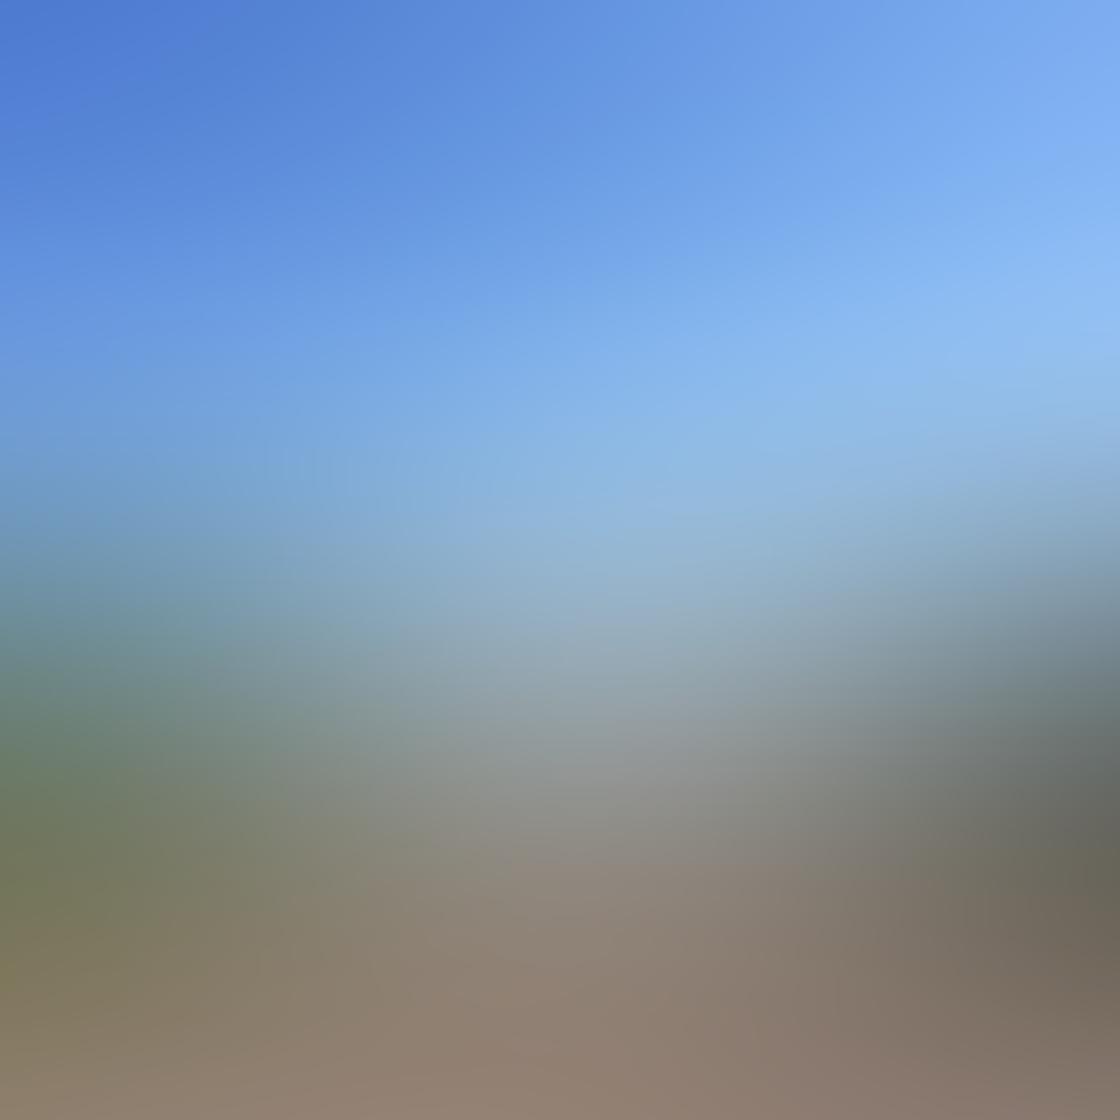 Minimalist Landscape iPhone Photos 1